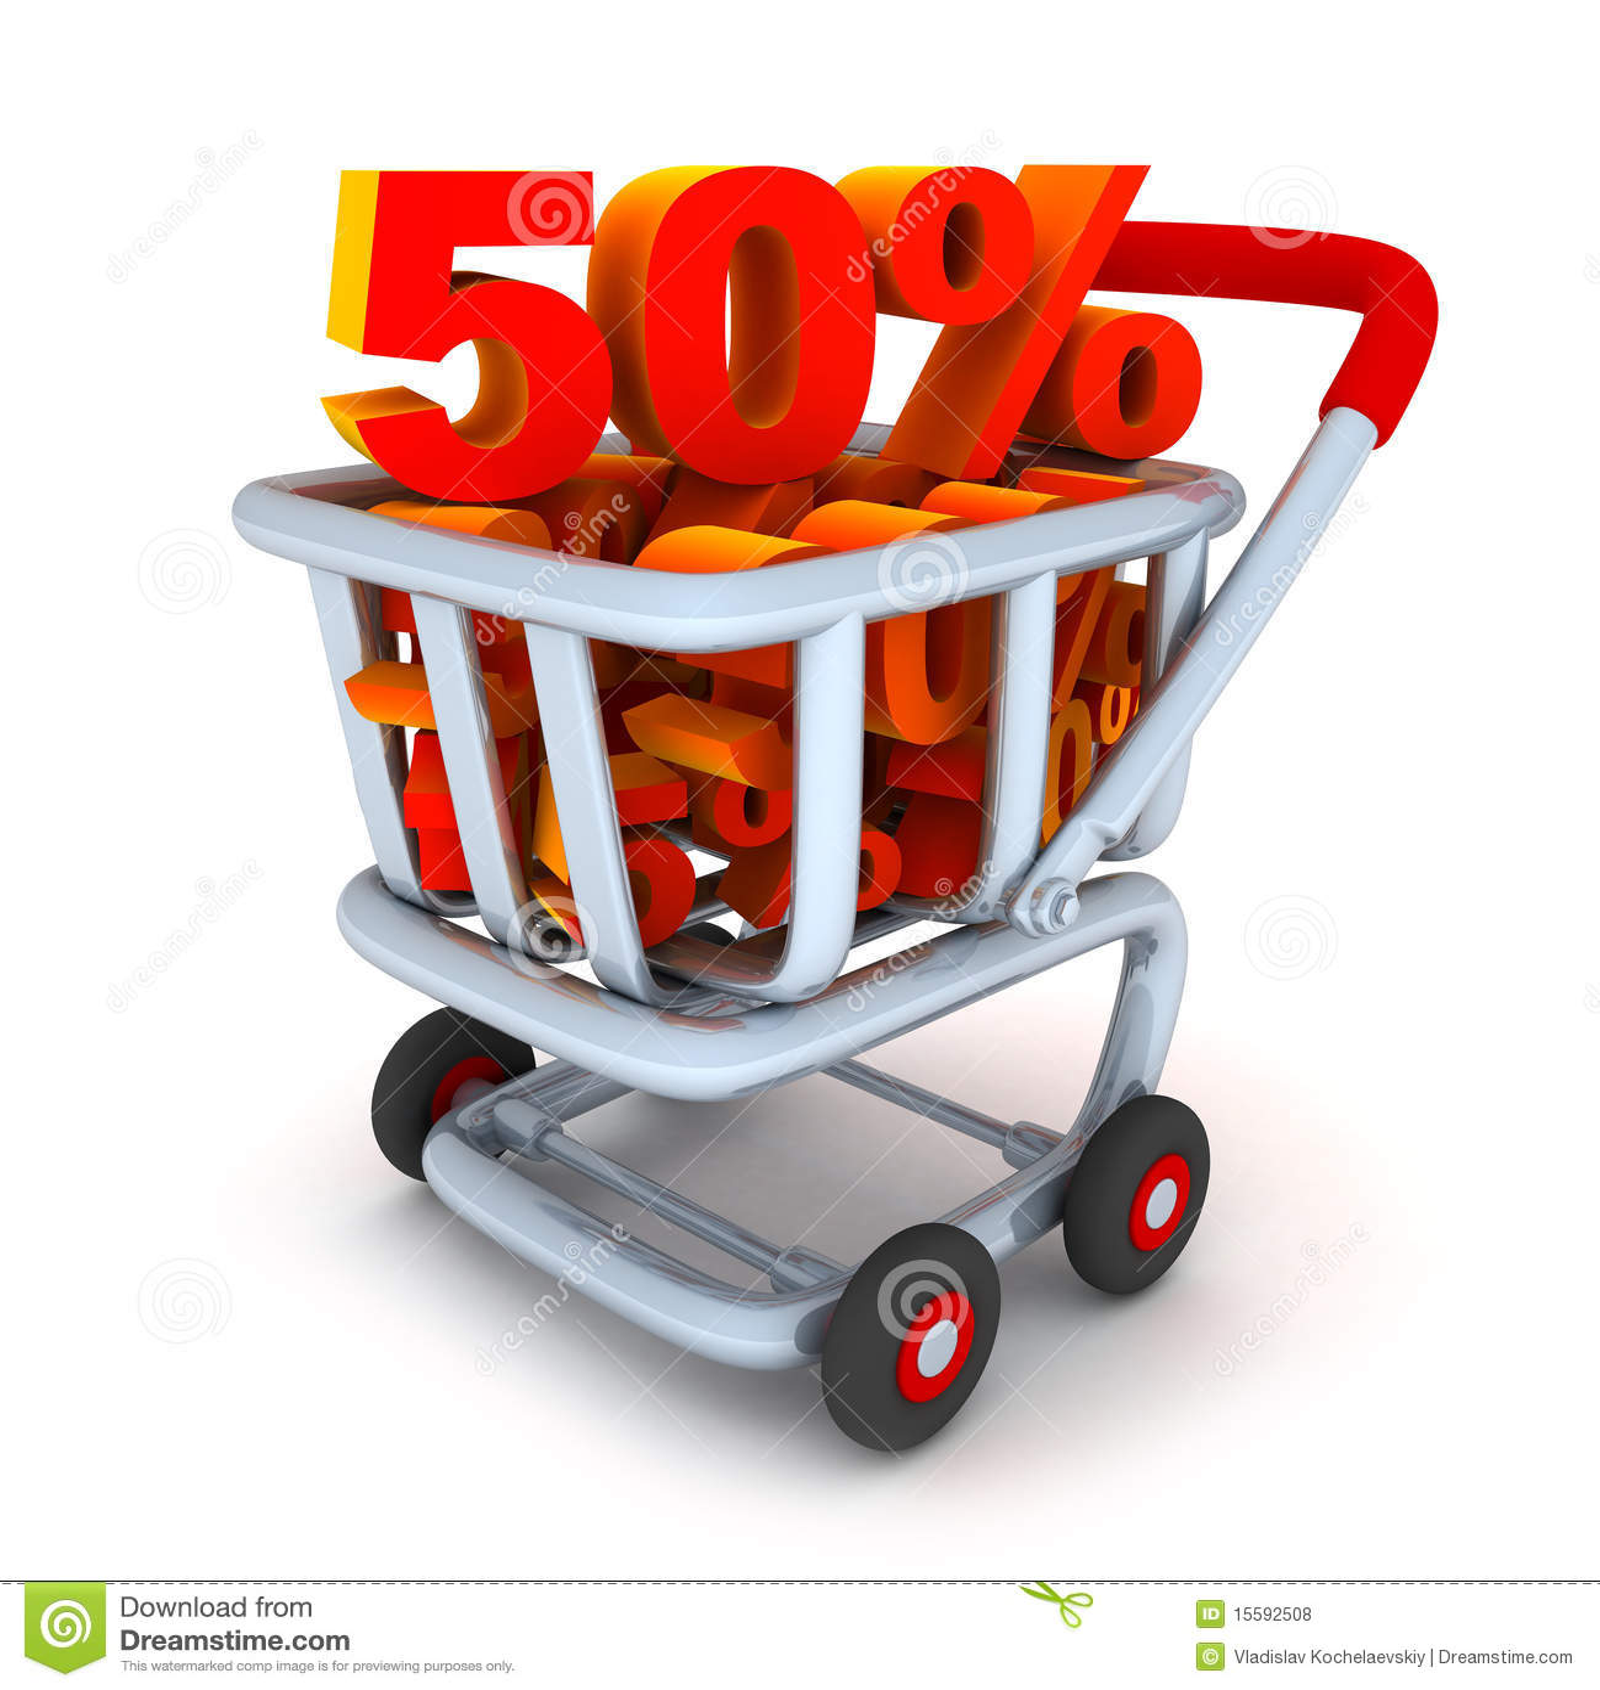 Cart and percent 50